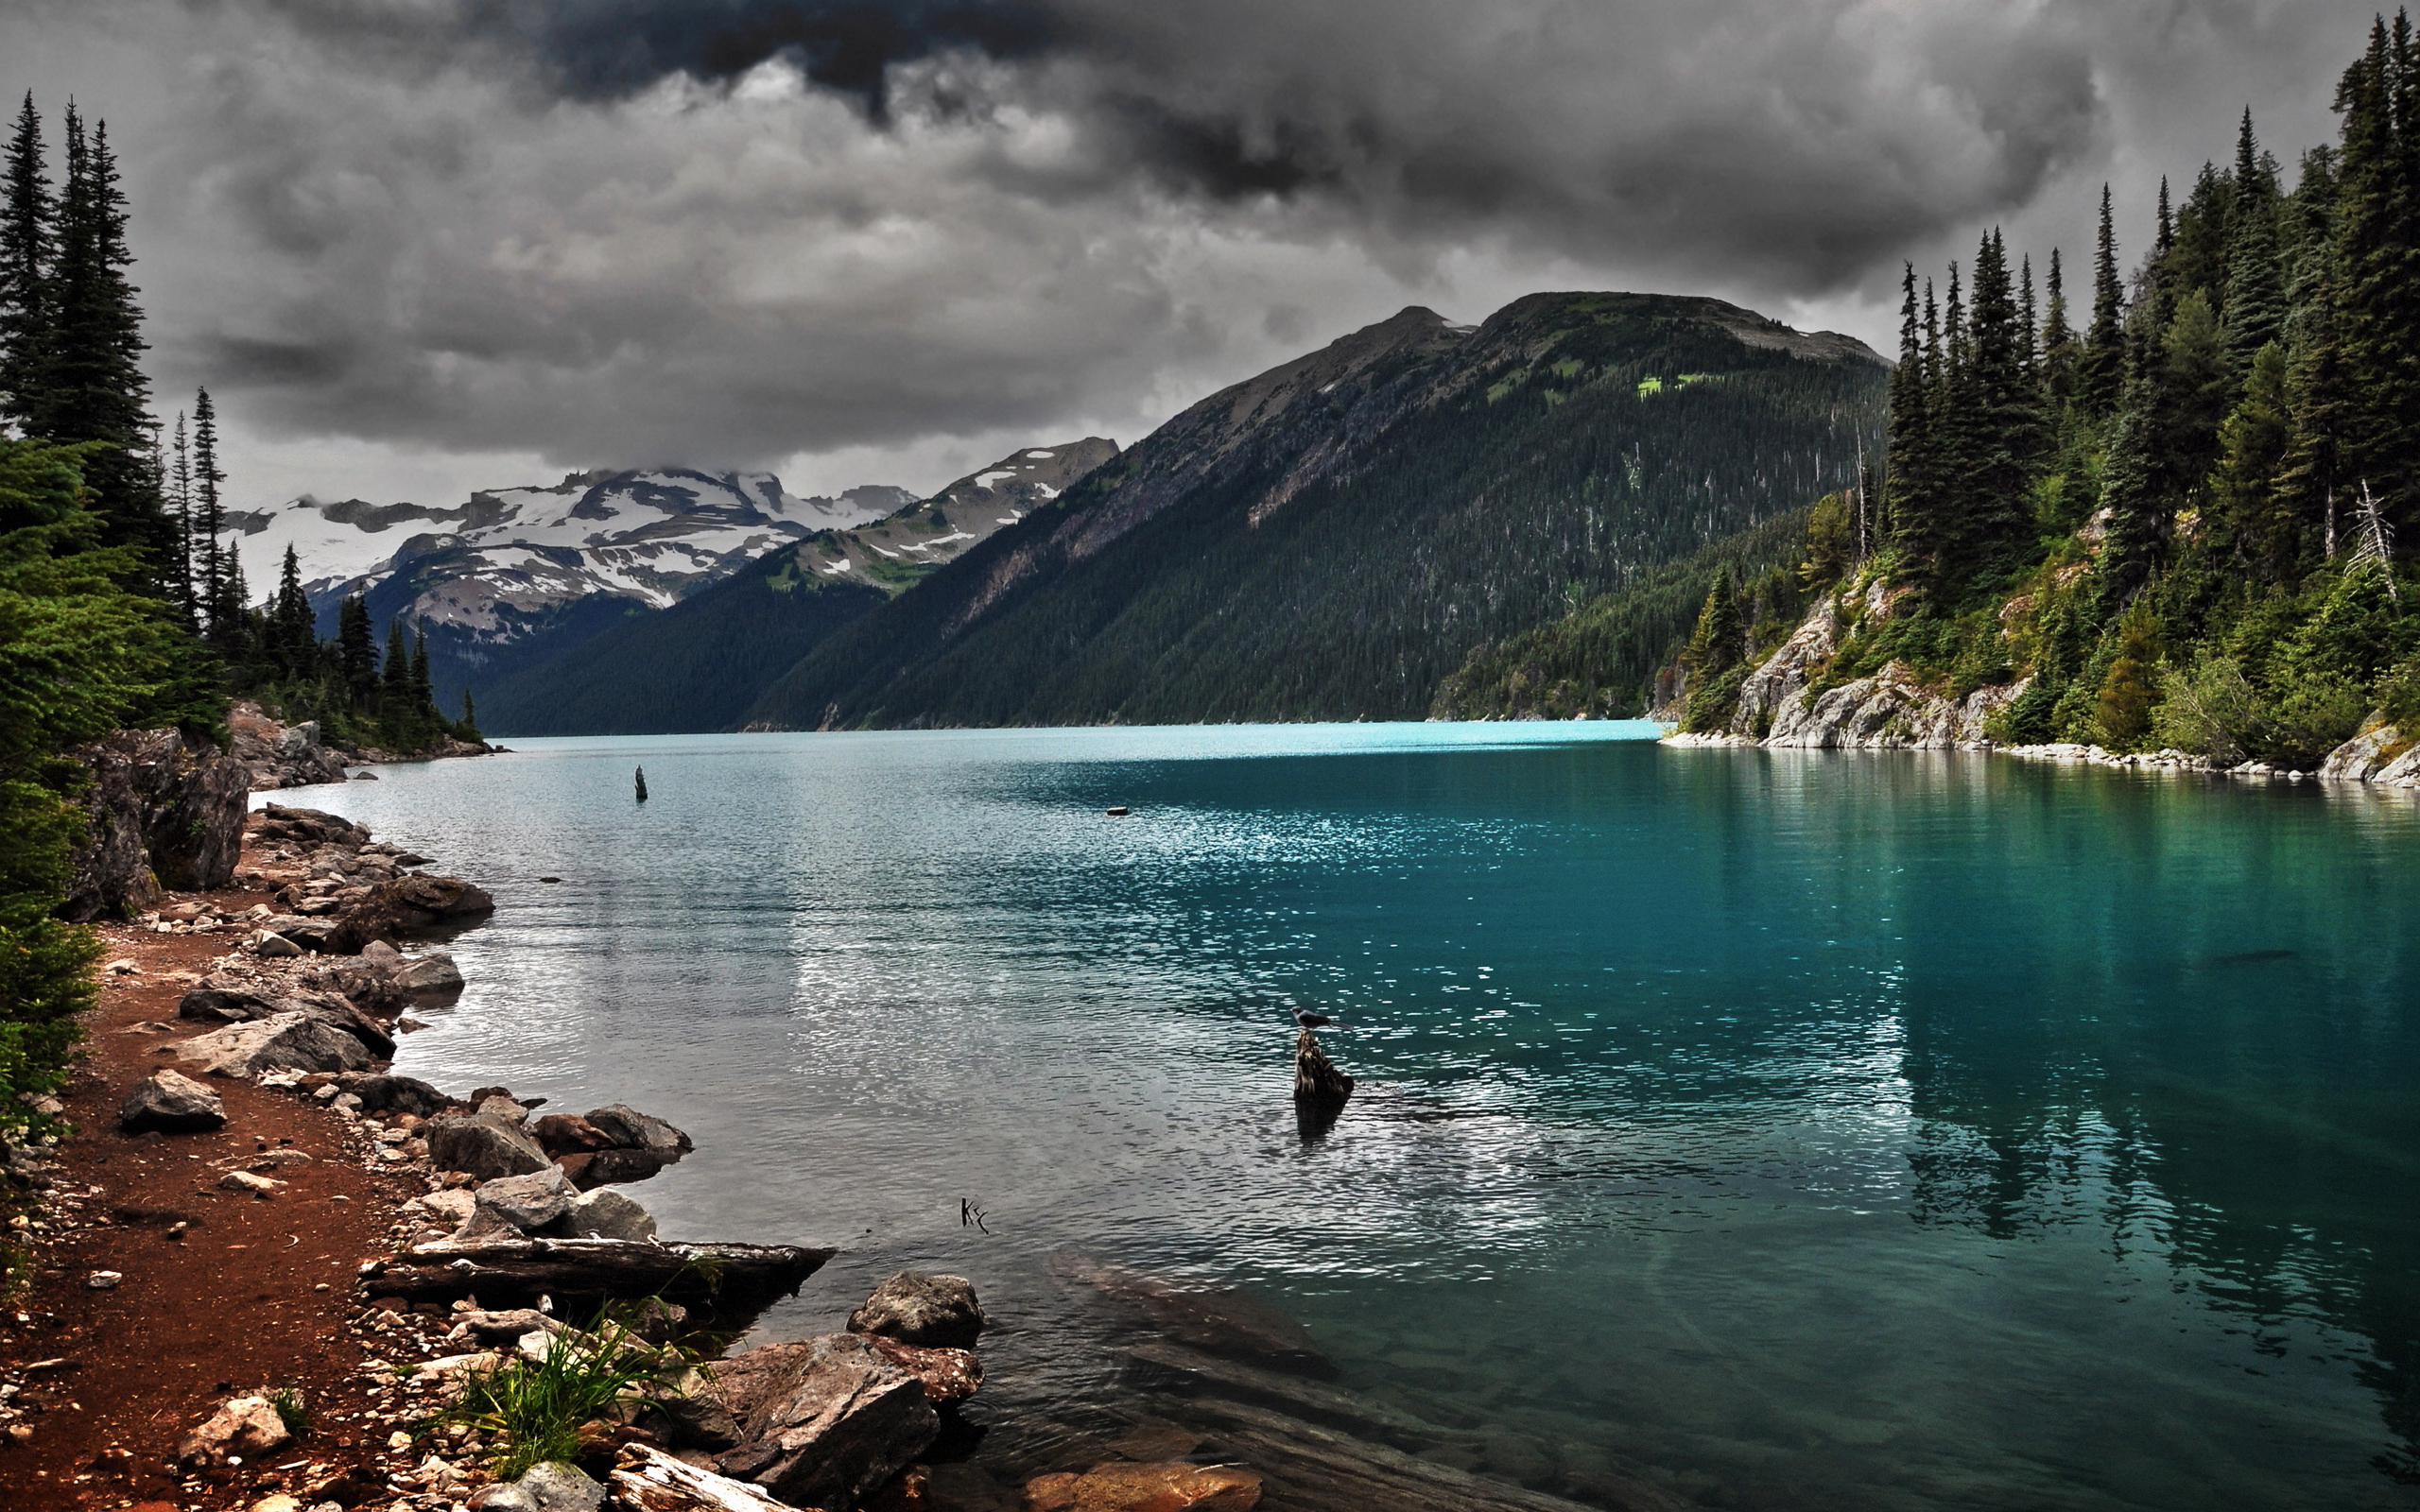 Lake mountain cloudy